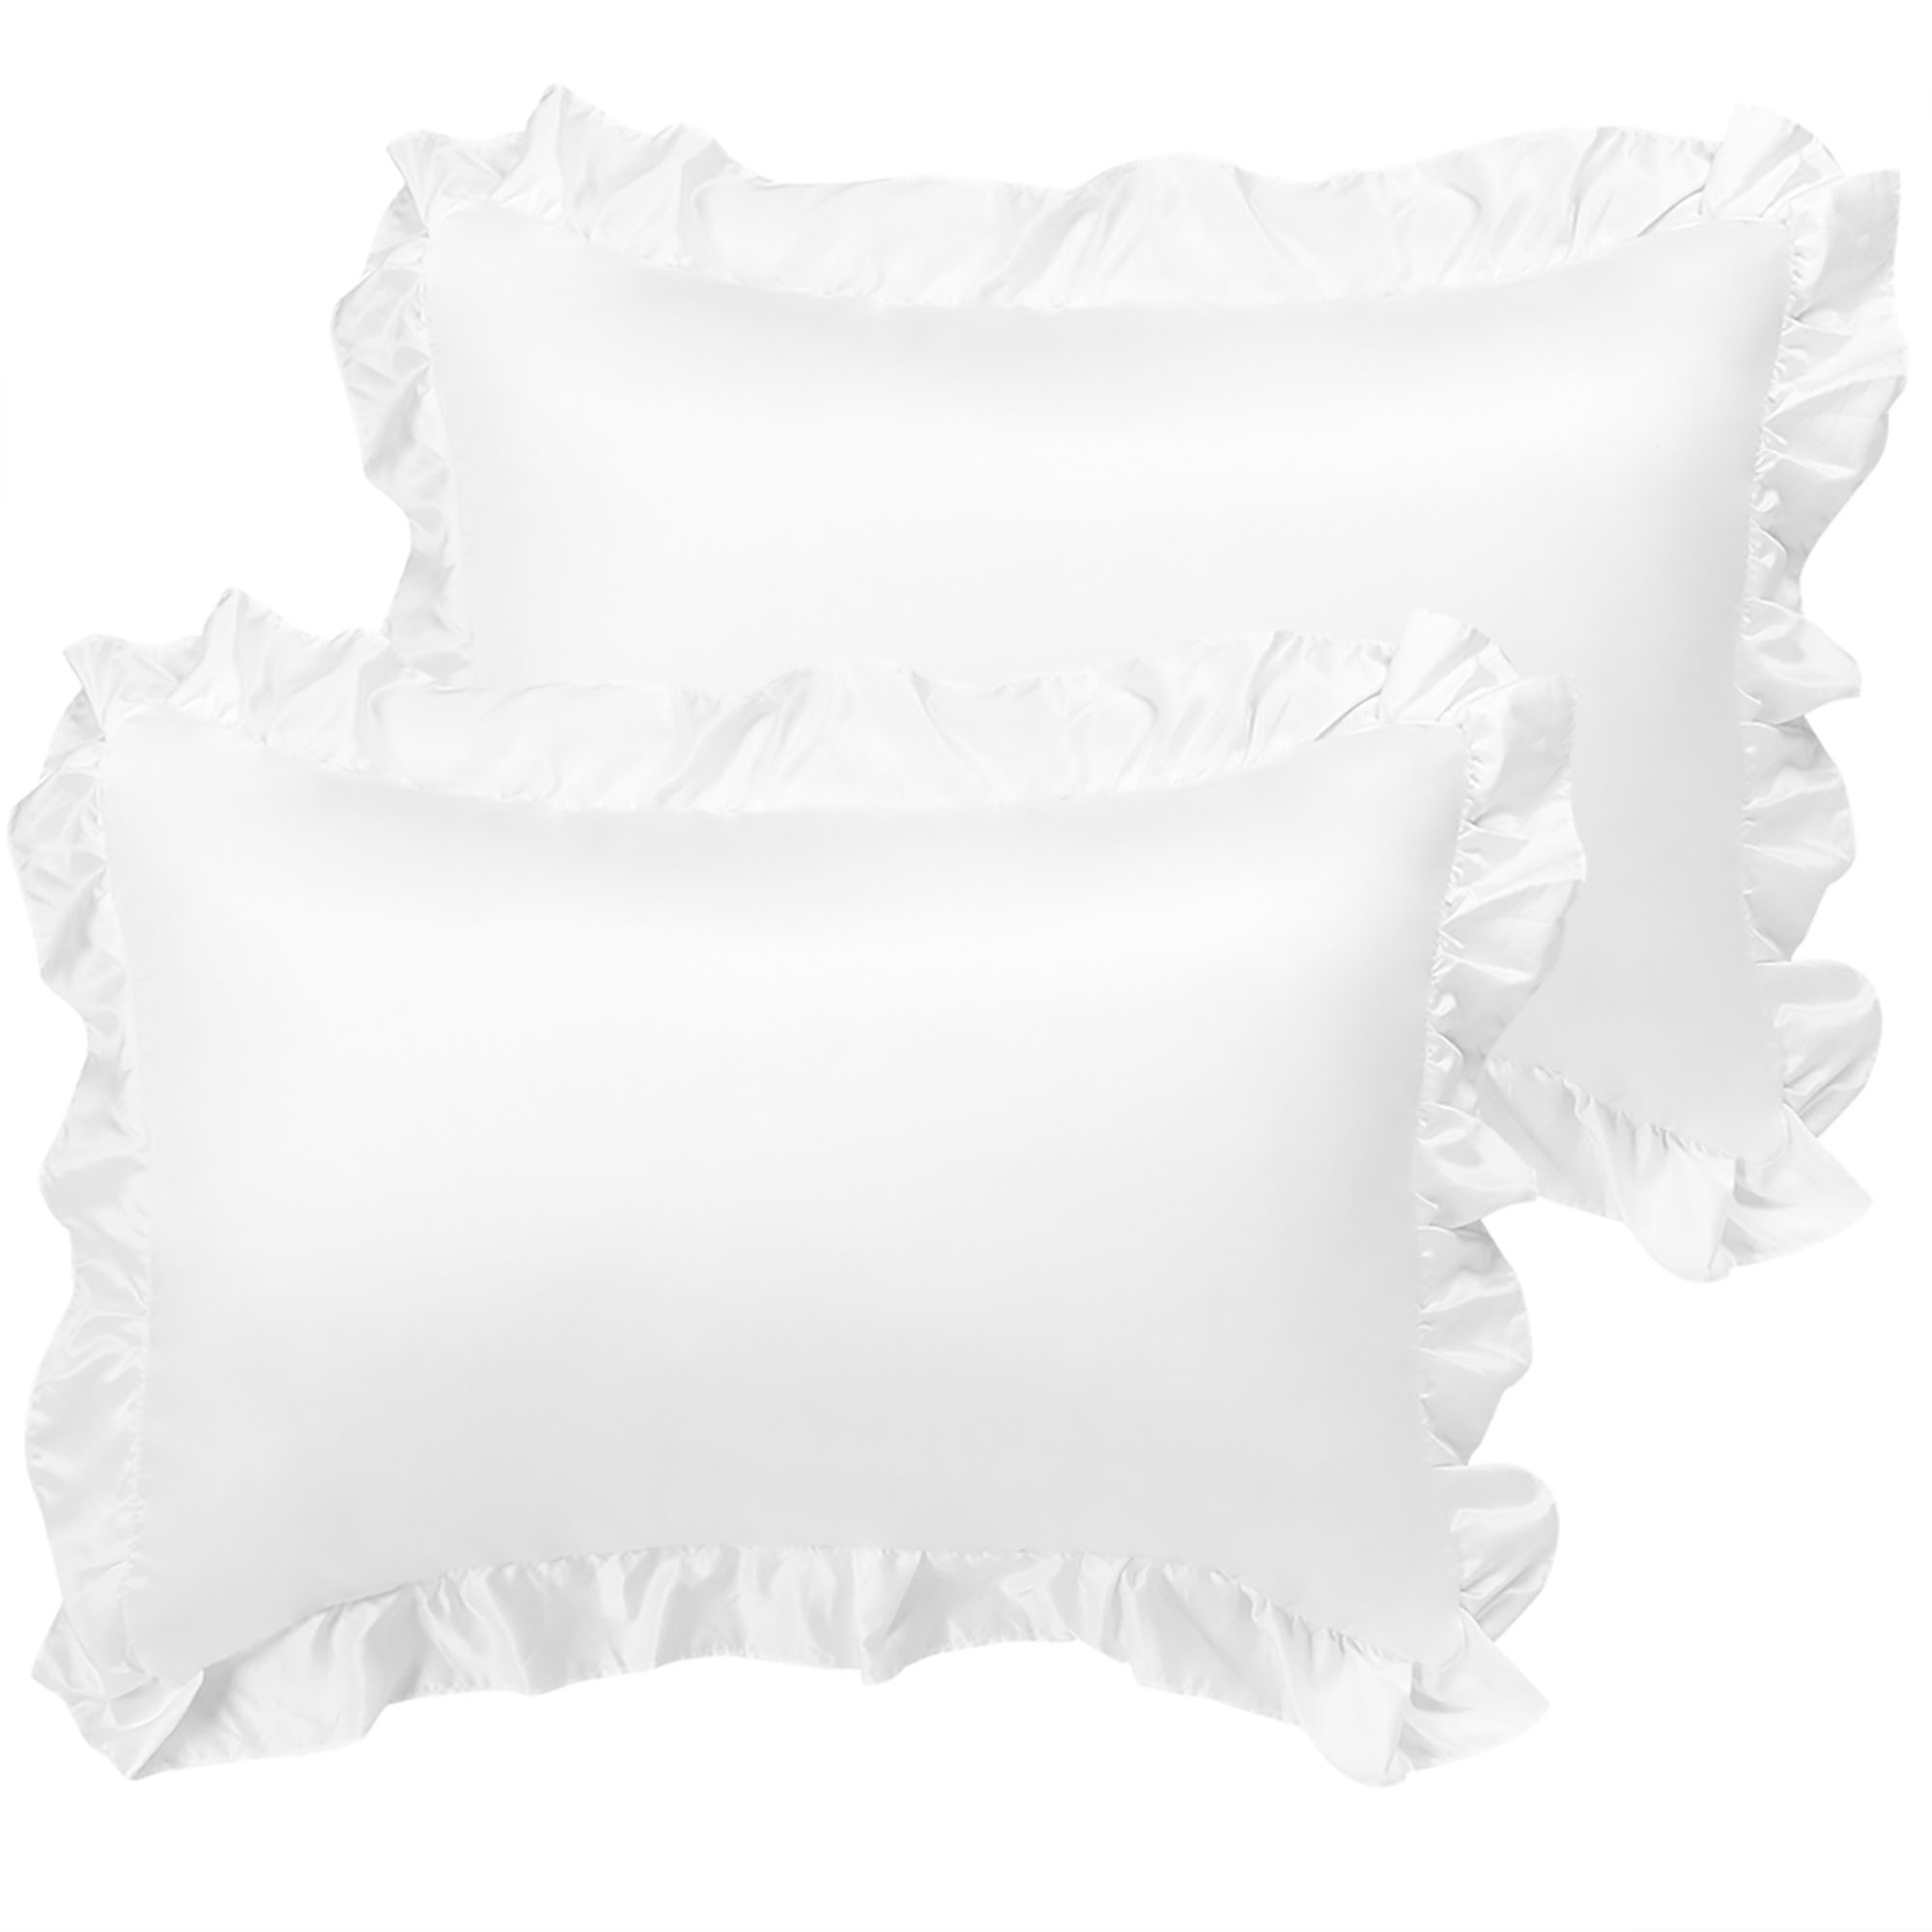 satin pillowcase king ruffled pillow shams set of 2 silky sateen pillow cases covers walmart com